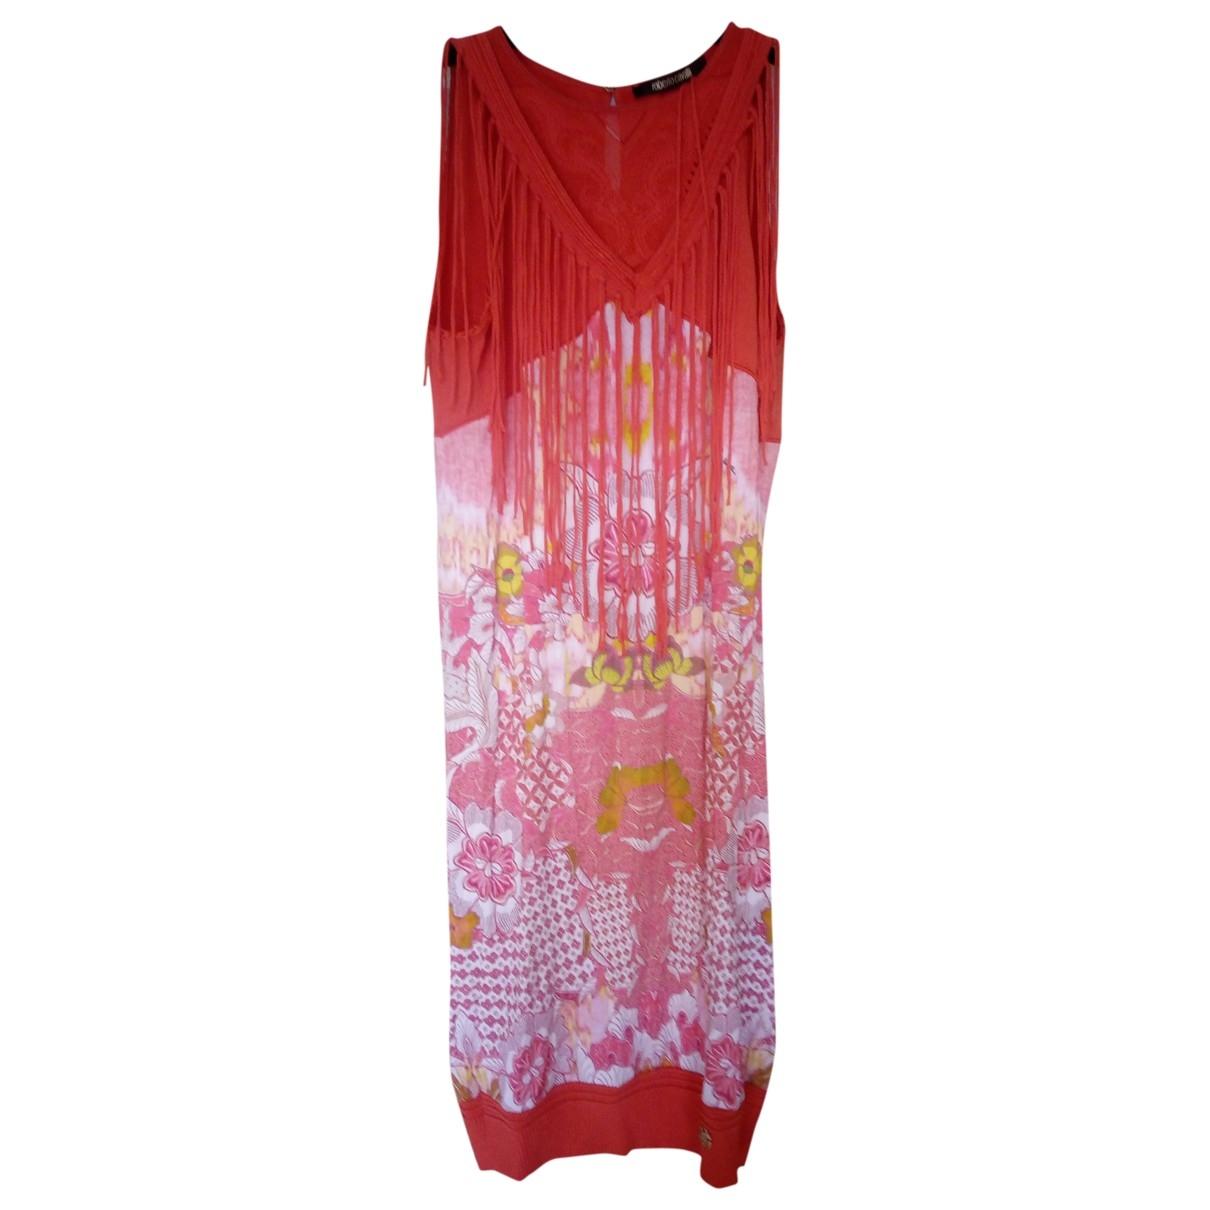 Roberto Cavalli \N Kleid in  Bunt Polyester